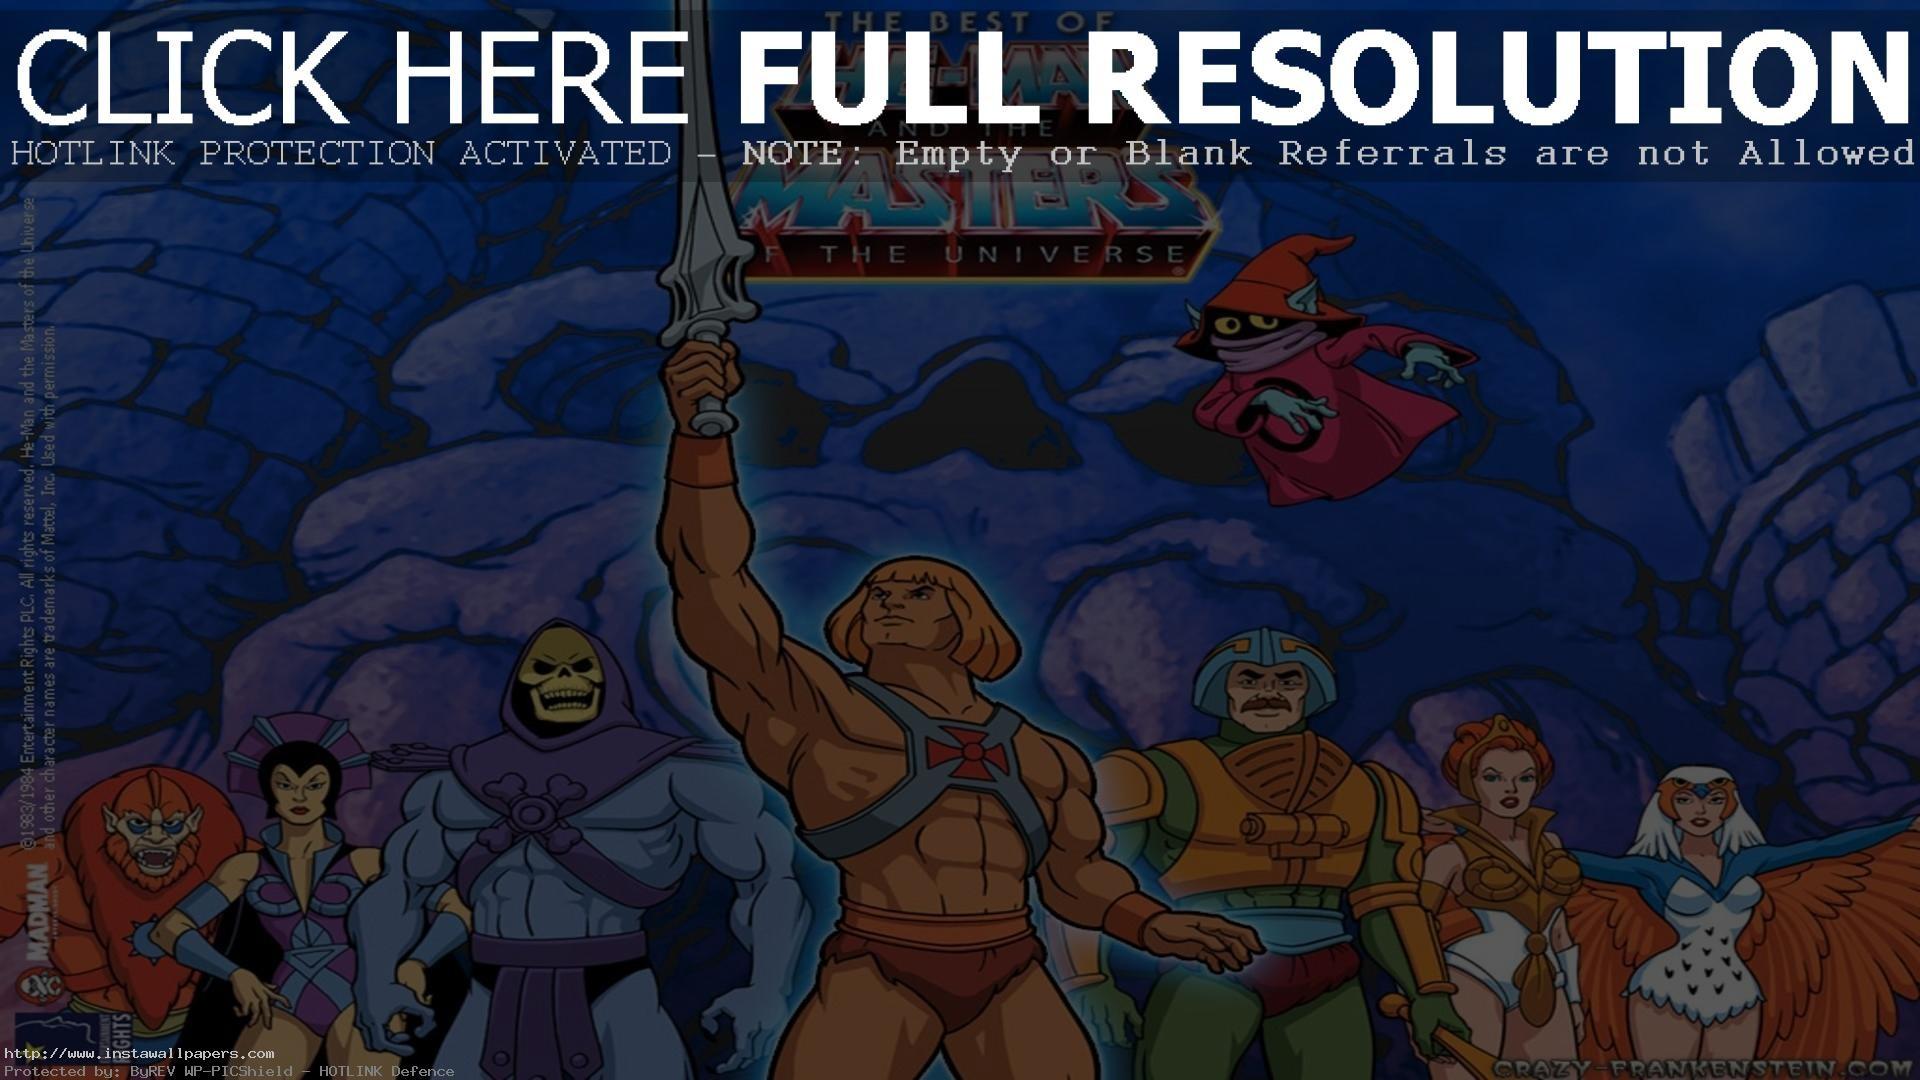 Download free He man Super Hero wallpapers HD